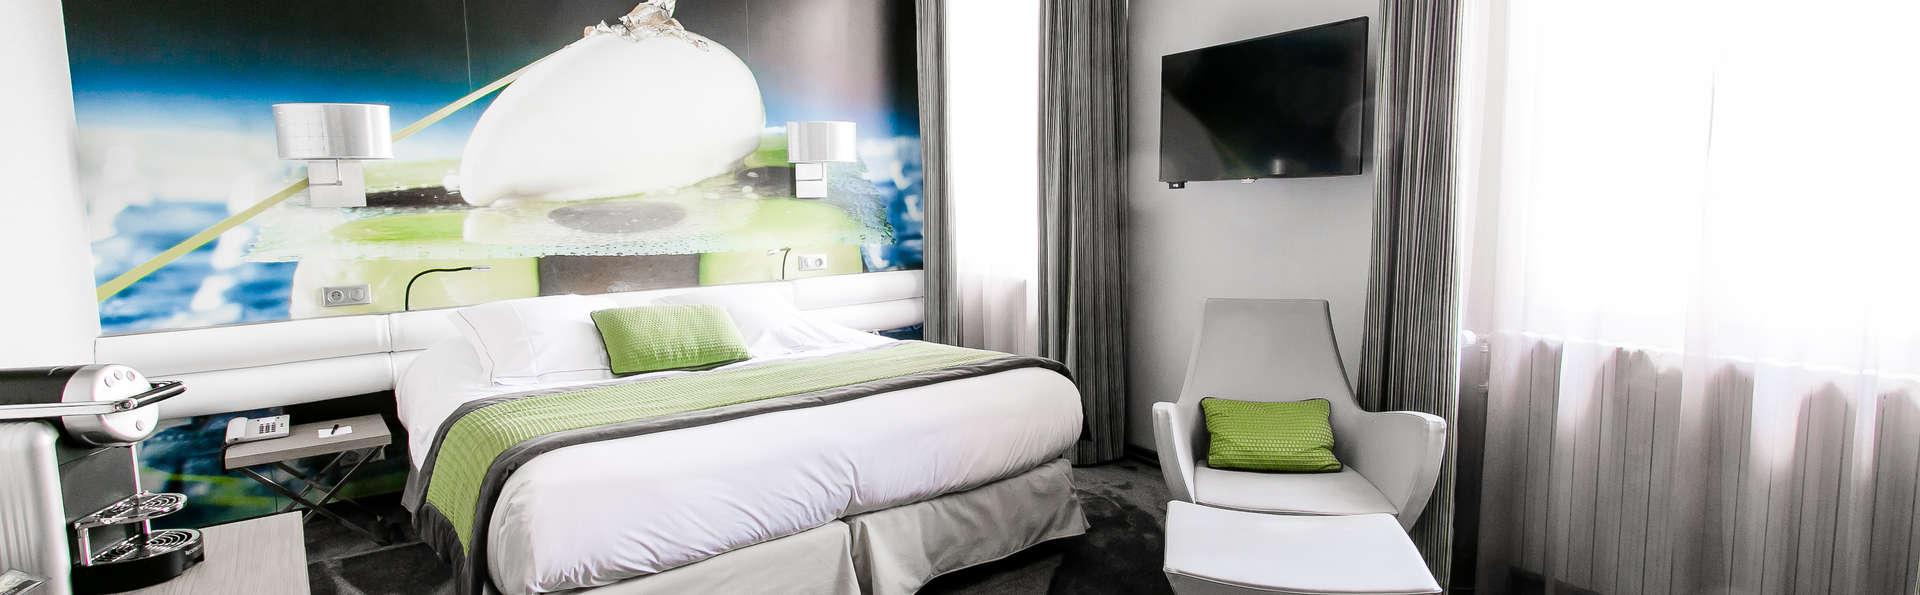 Hostellerie du Chapeau Rouge - Hostellerie_du_Chapeau_rouge_Dijon____Julien_Faure__24_.jpg